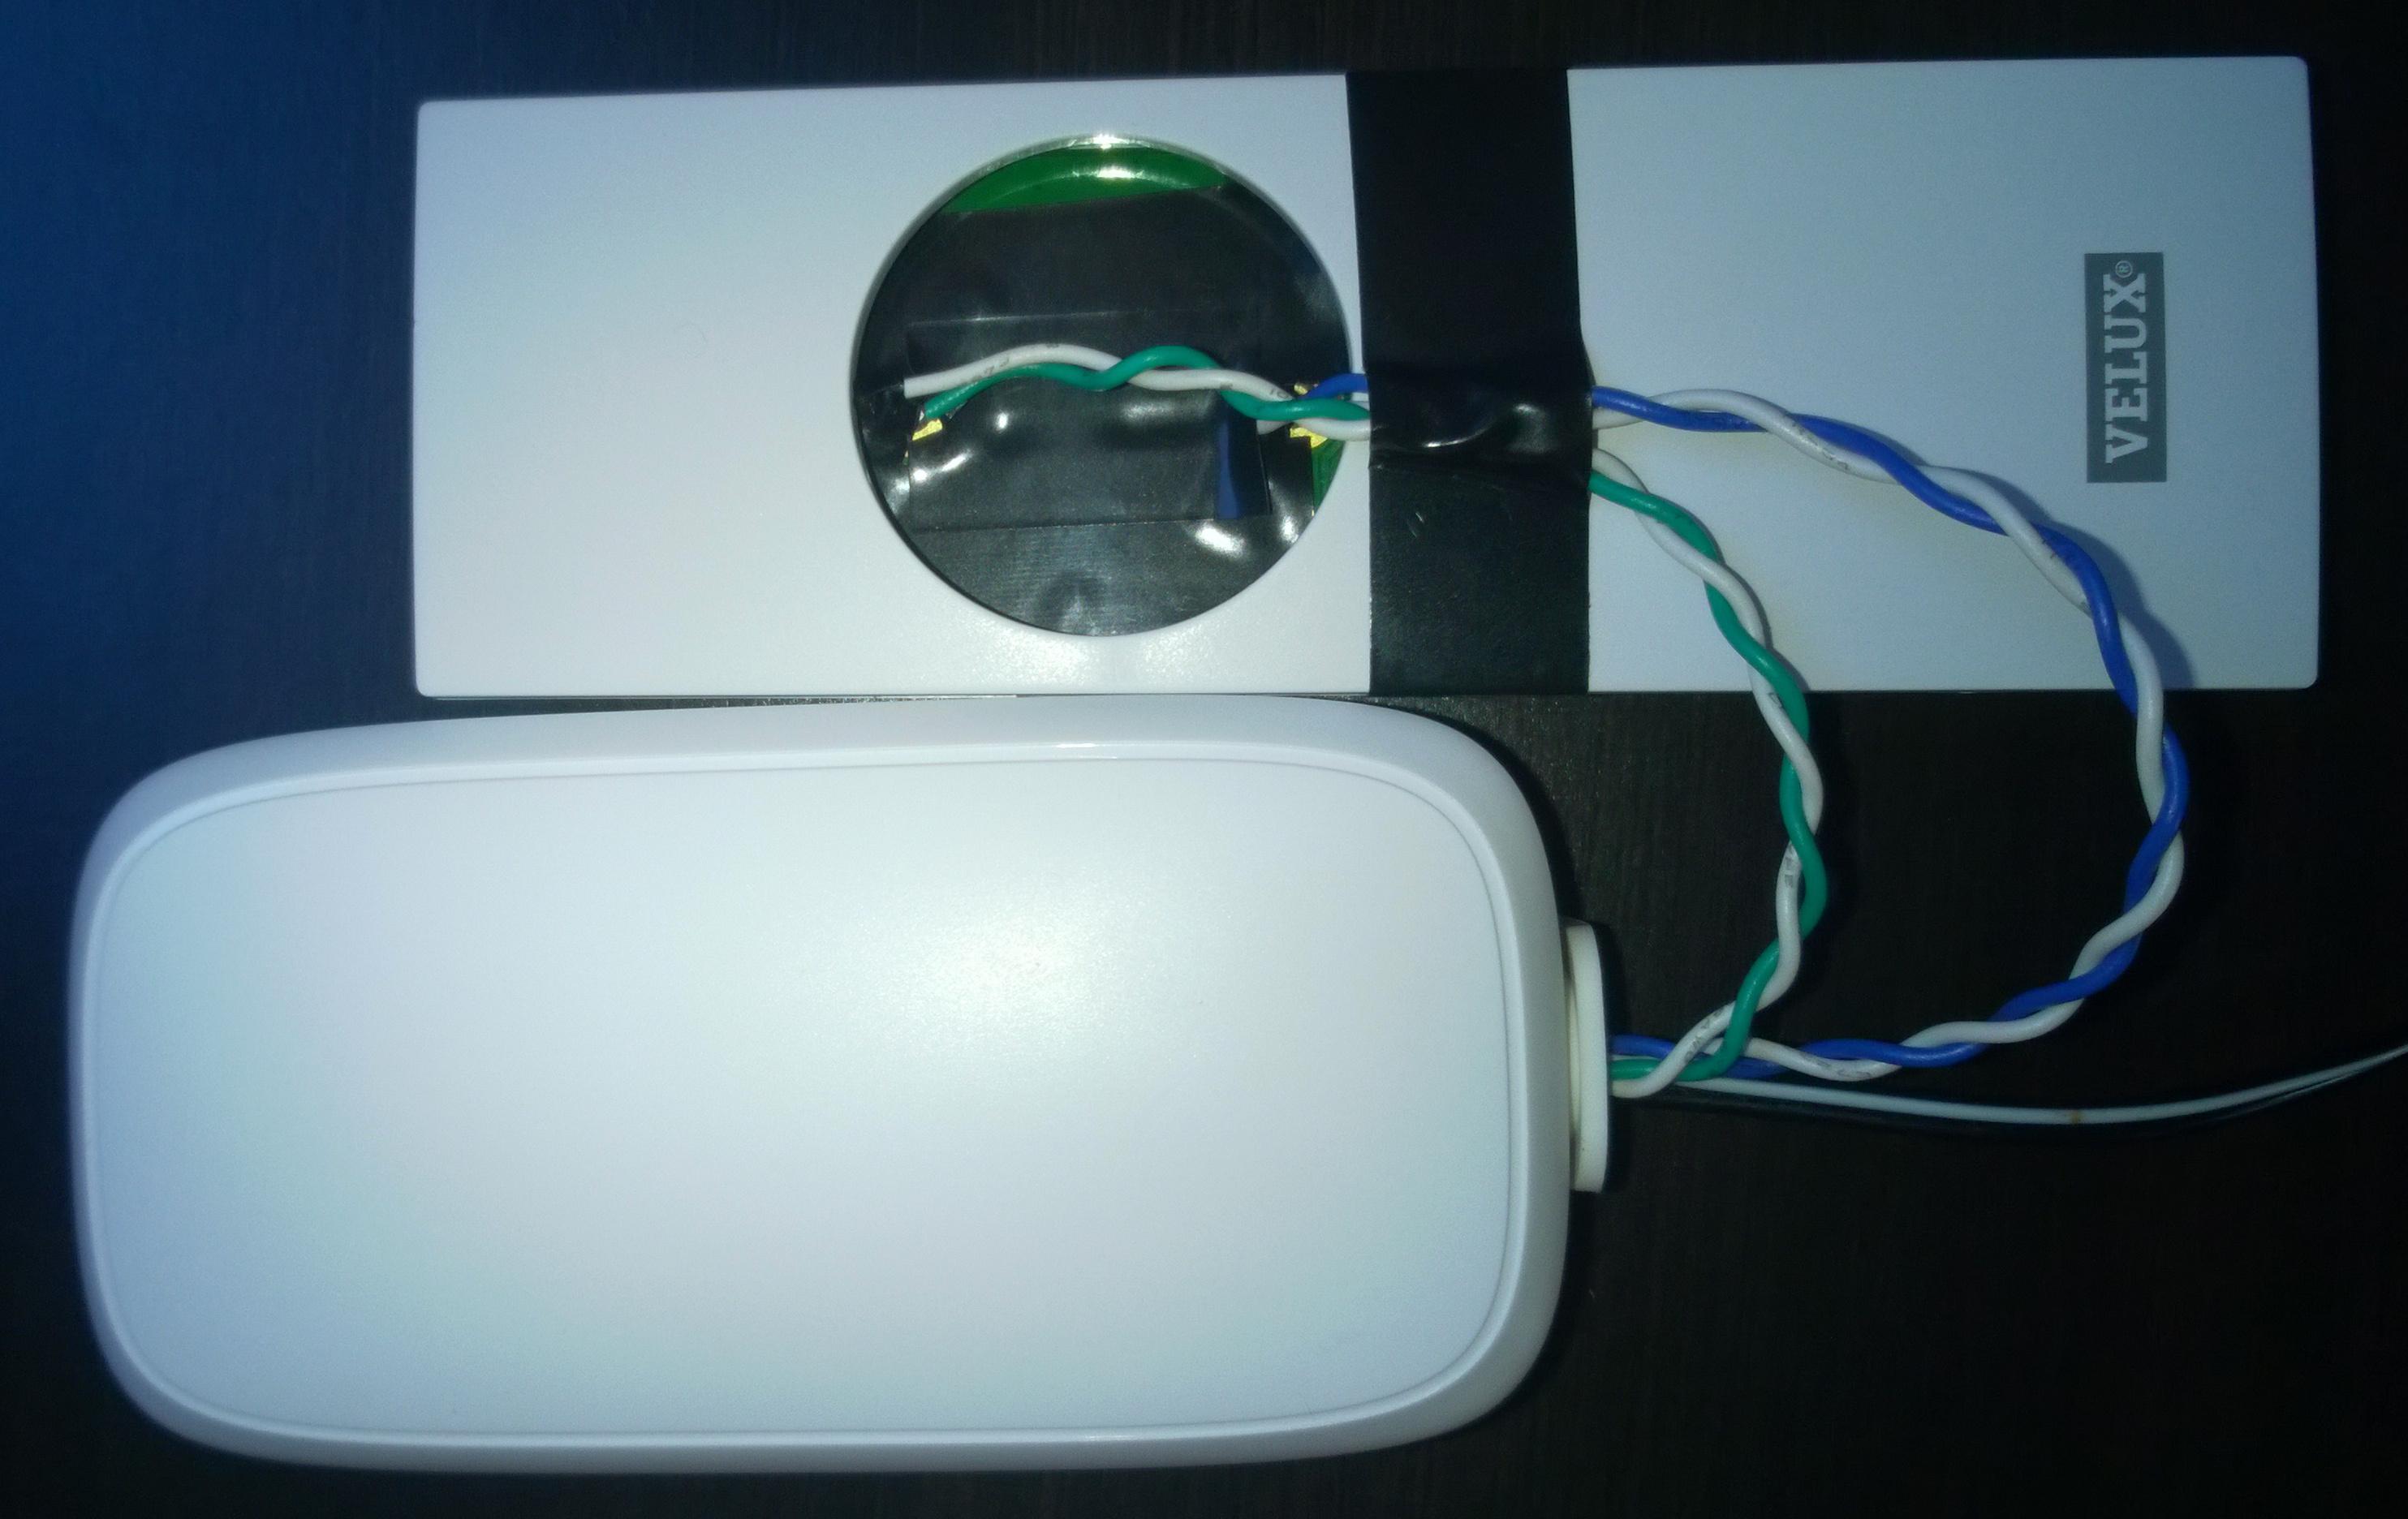 volet roulant electrique velux transformateur. Black Bedroom Furniture Sets. Home Design Ideas